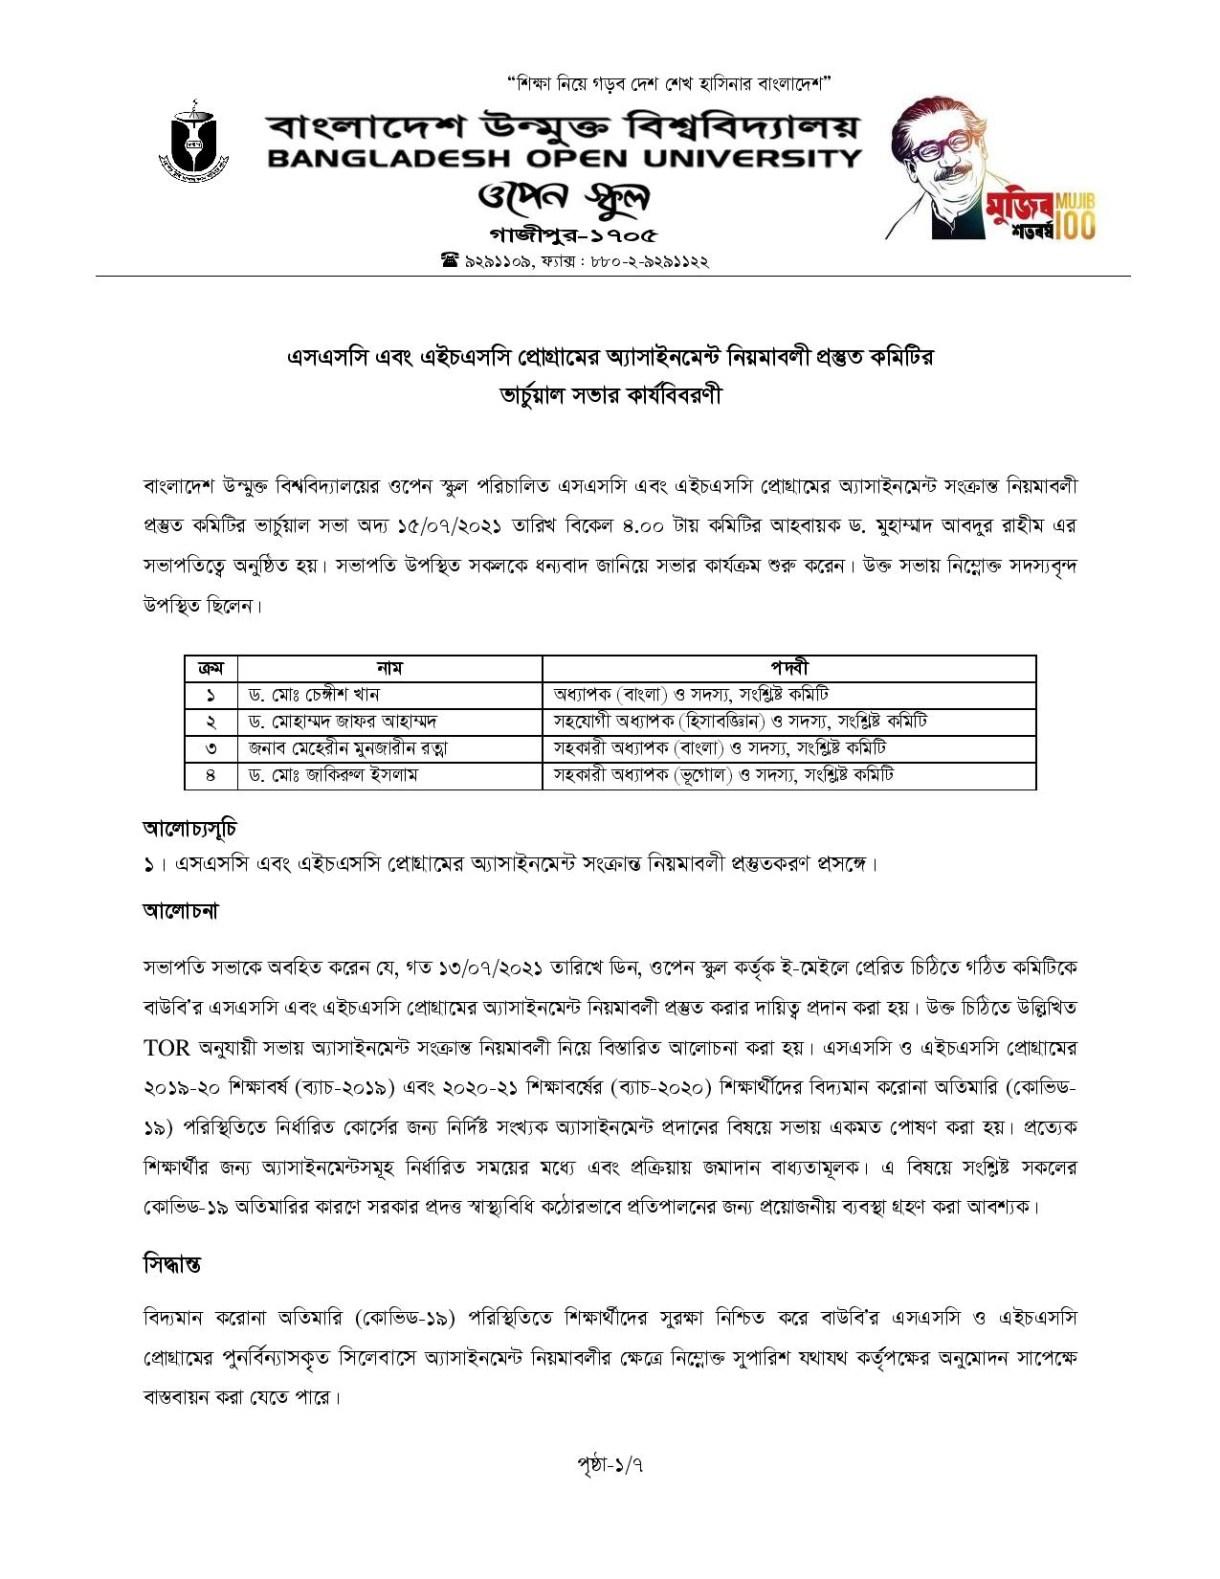 Bangladesh Open University BOU HSC Assignment Answer 2021 Pdf Download 21